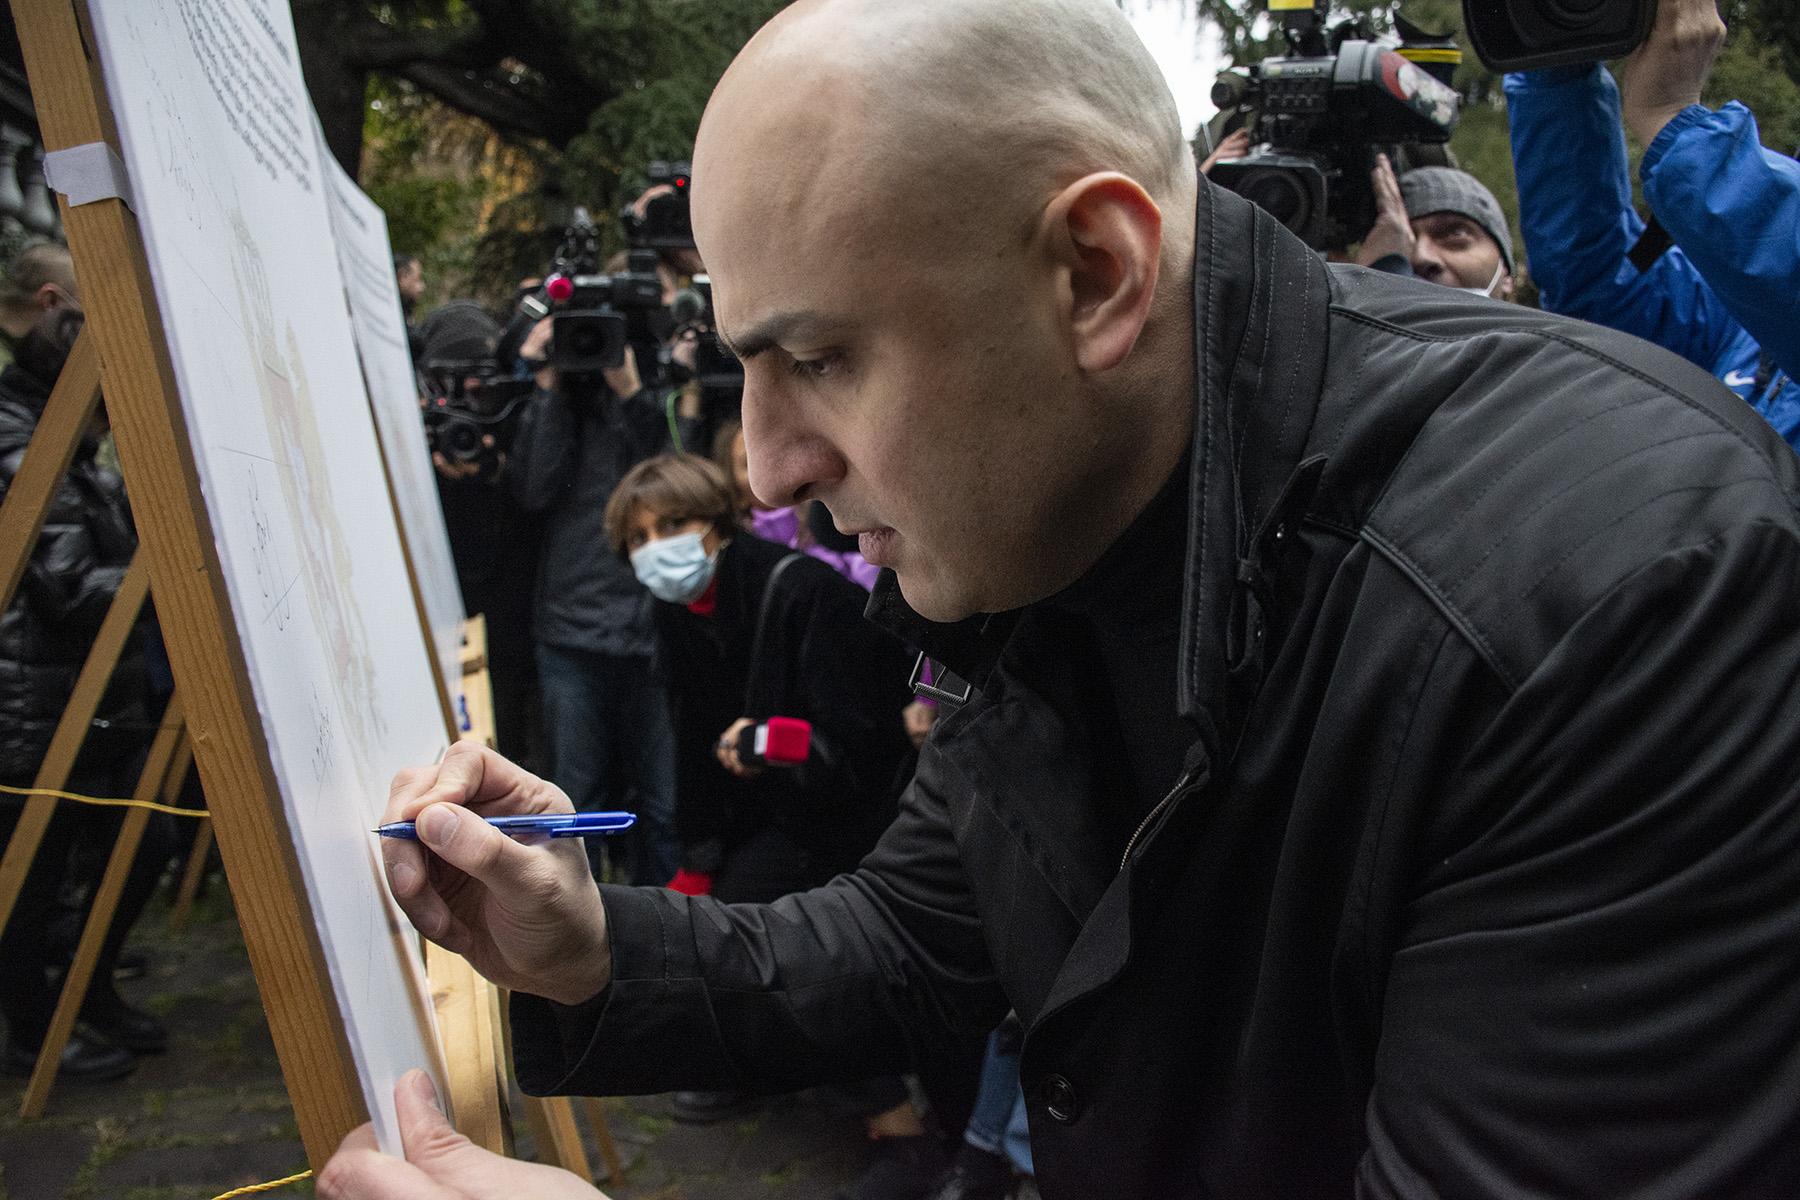 Ника Мелиа из ЕНД подписывает меморандум. Фото: Мариам Никурадзе / OC Media.